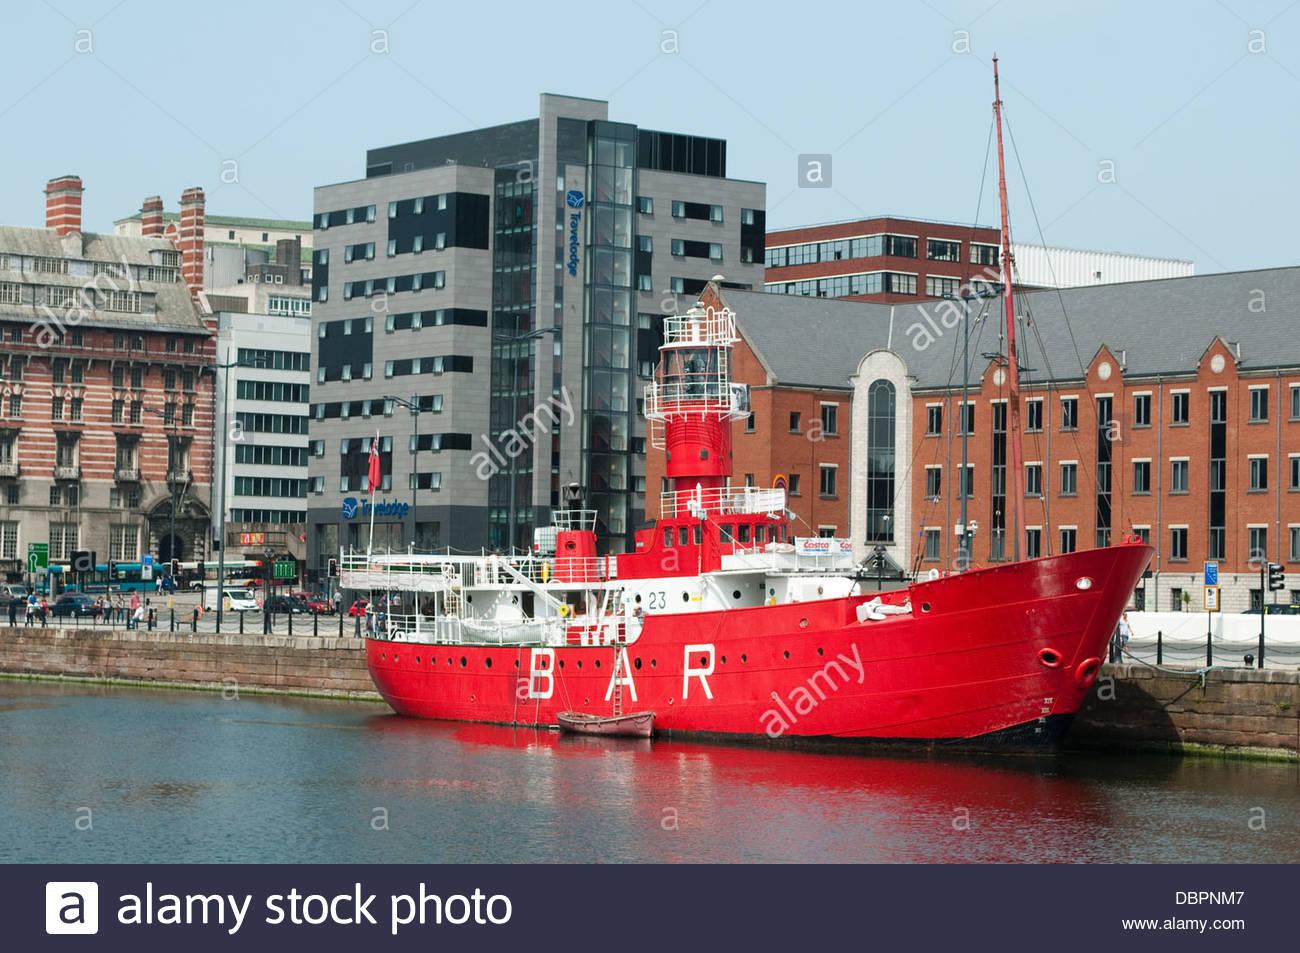 Boat Bar, Cunning Dock, Liverpool, UK - Stock Image